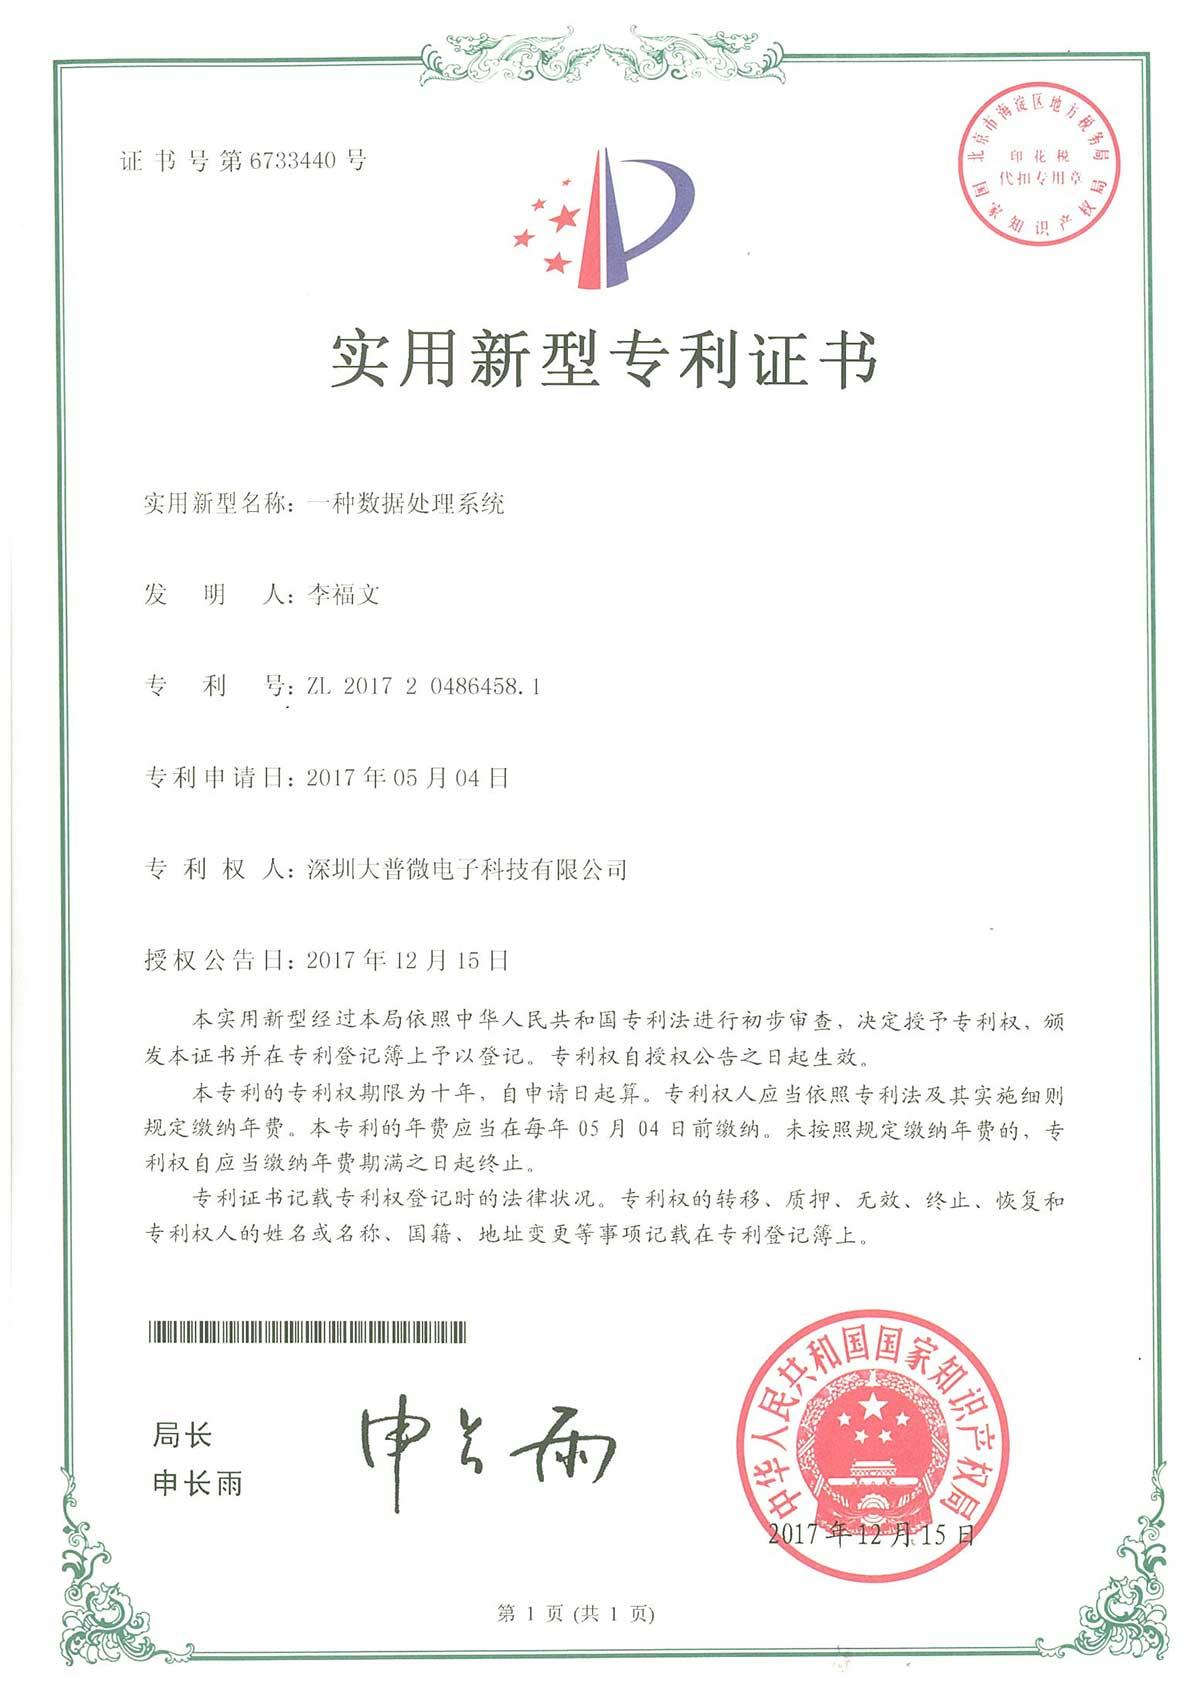 DCN2-17005-实用新型专利证书(一种数据处理系统)